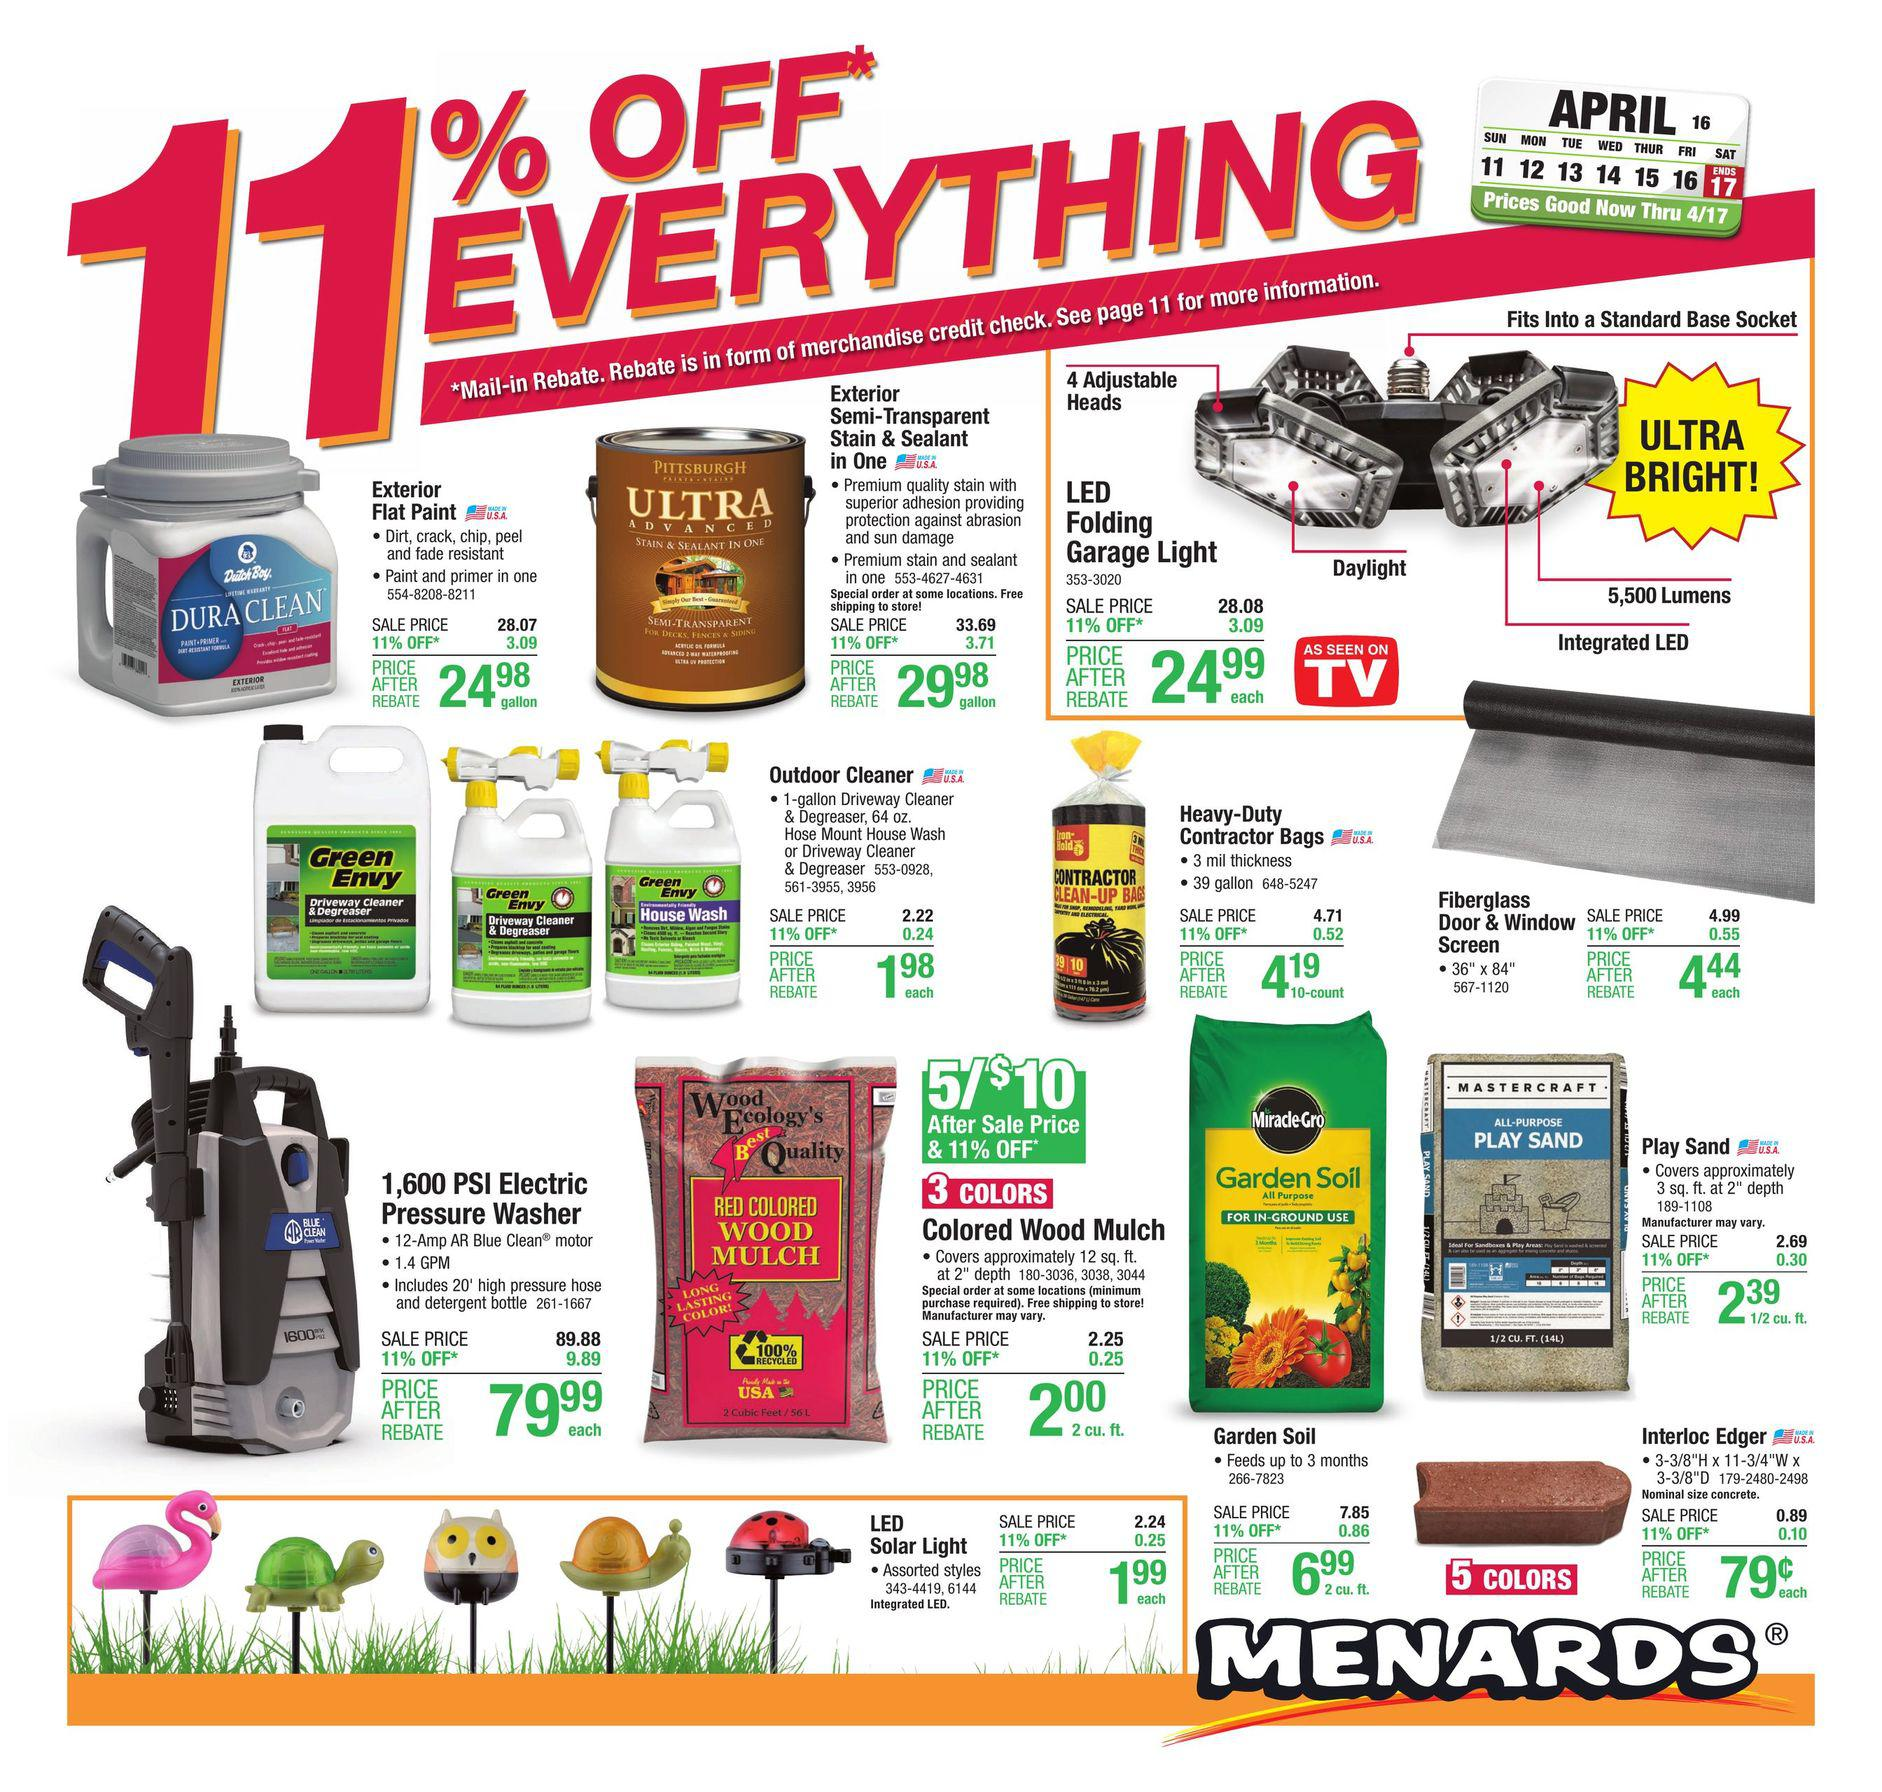 Menards Ad Deals April 11 - April 17, 2021. 11% Off Everything!